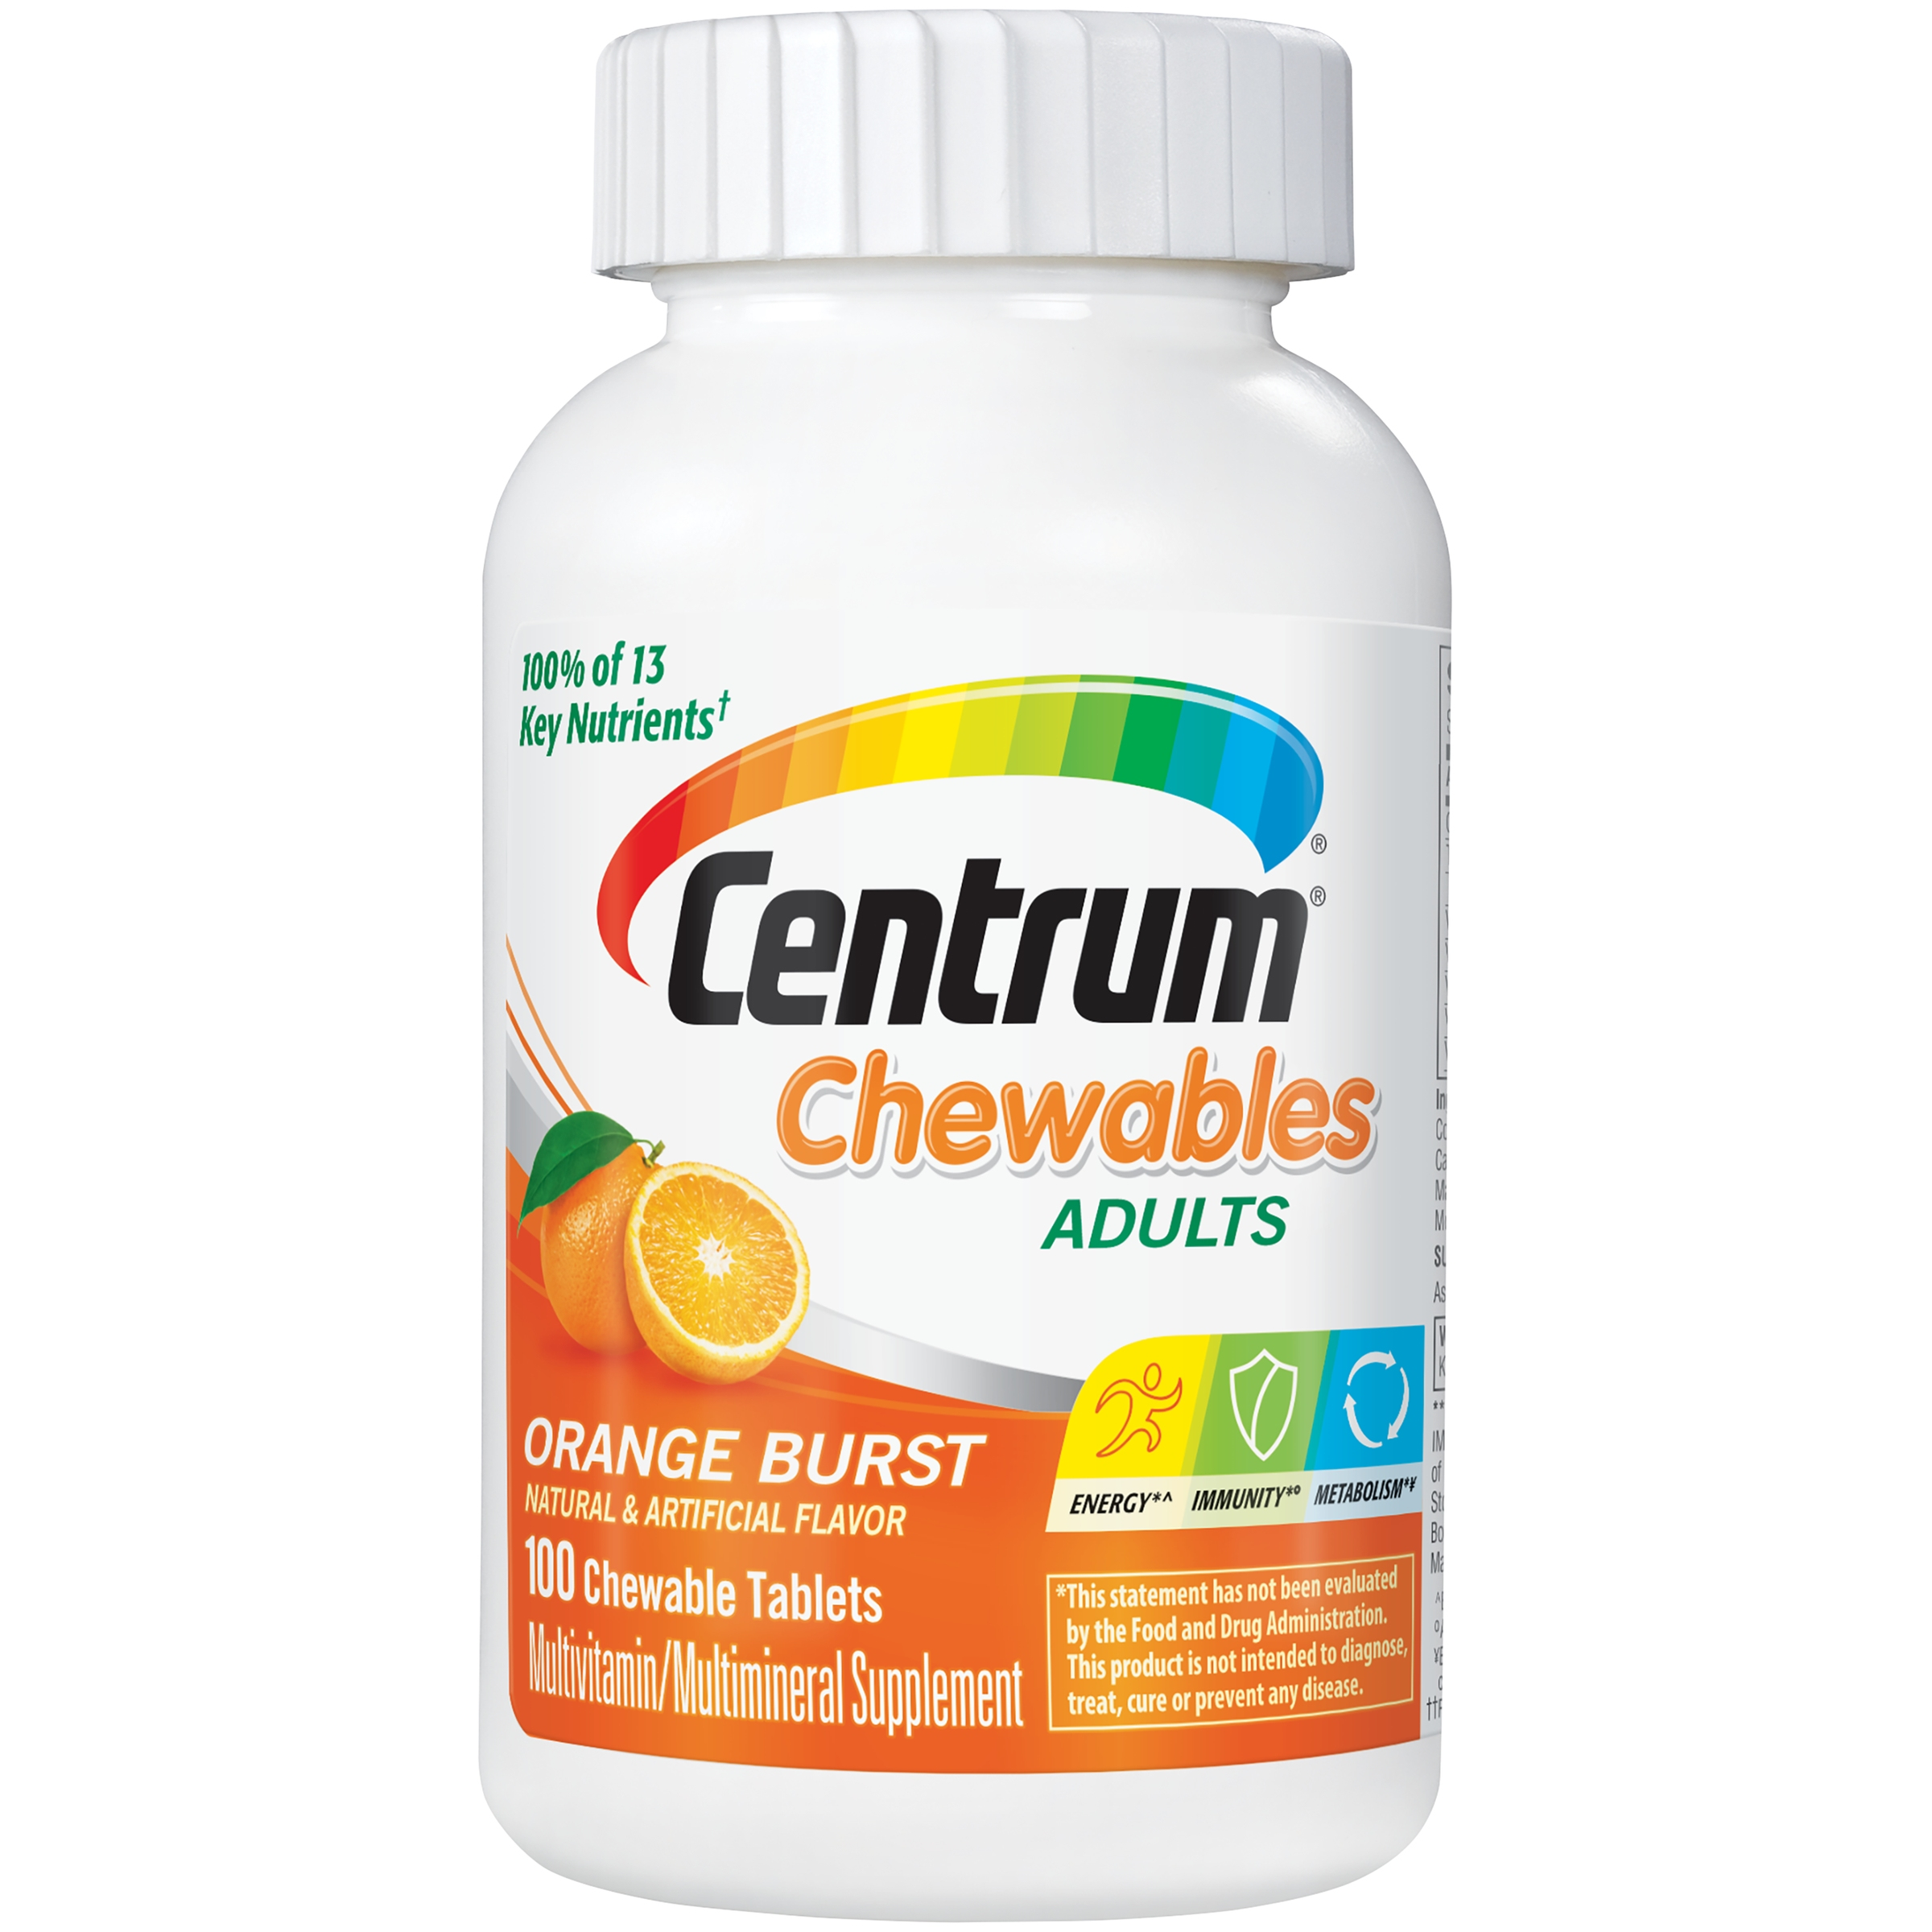 Centrum Chewables Adults Multivitamin/Multimineral Supplement Orange Burst Chewable Tablets 100 ct Bottle